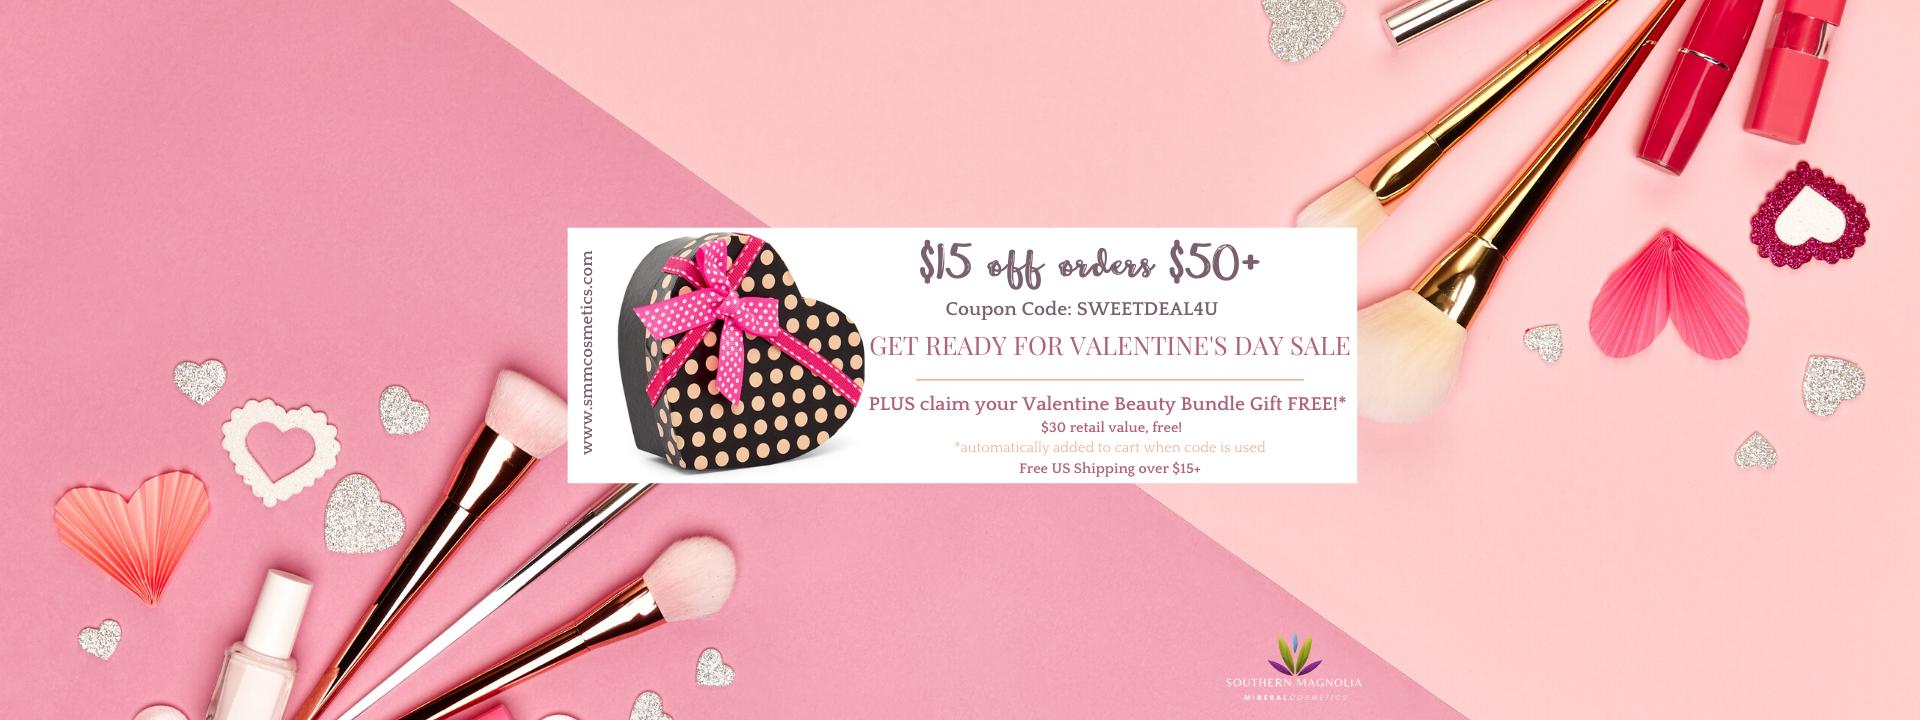 valentines-sale-retail-banner.png